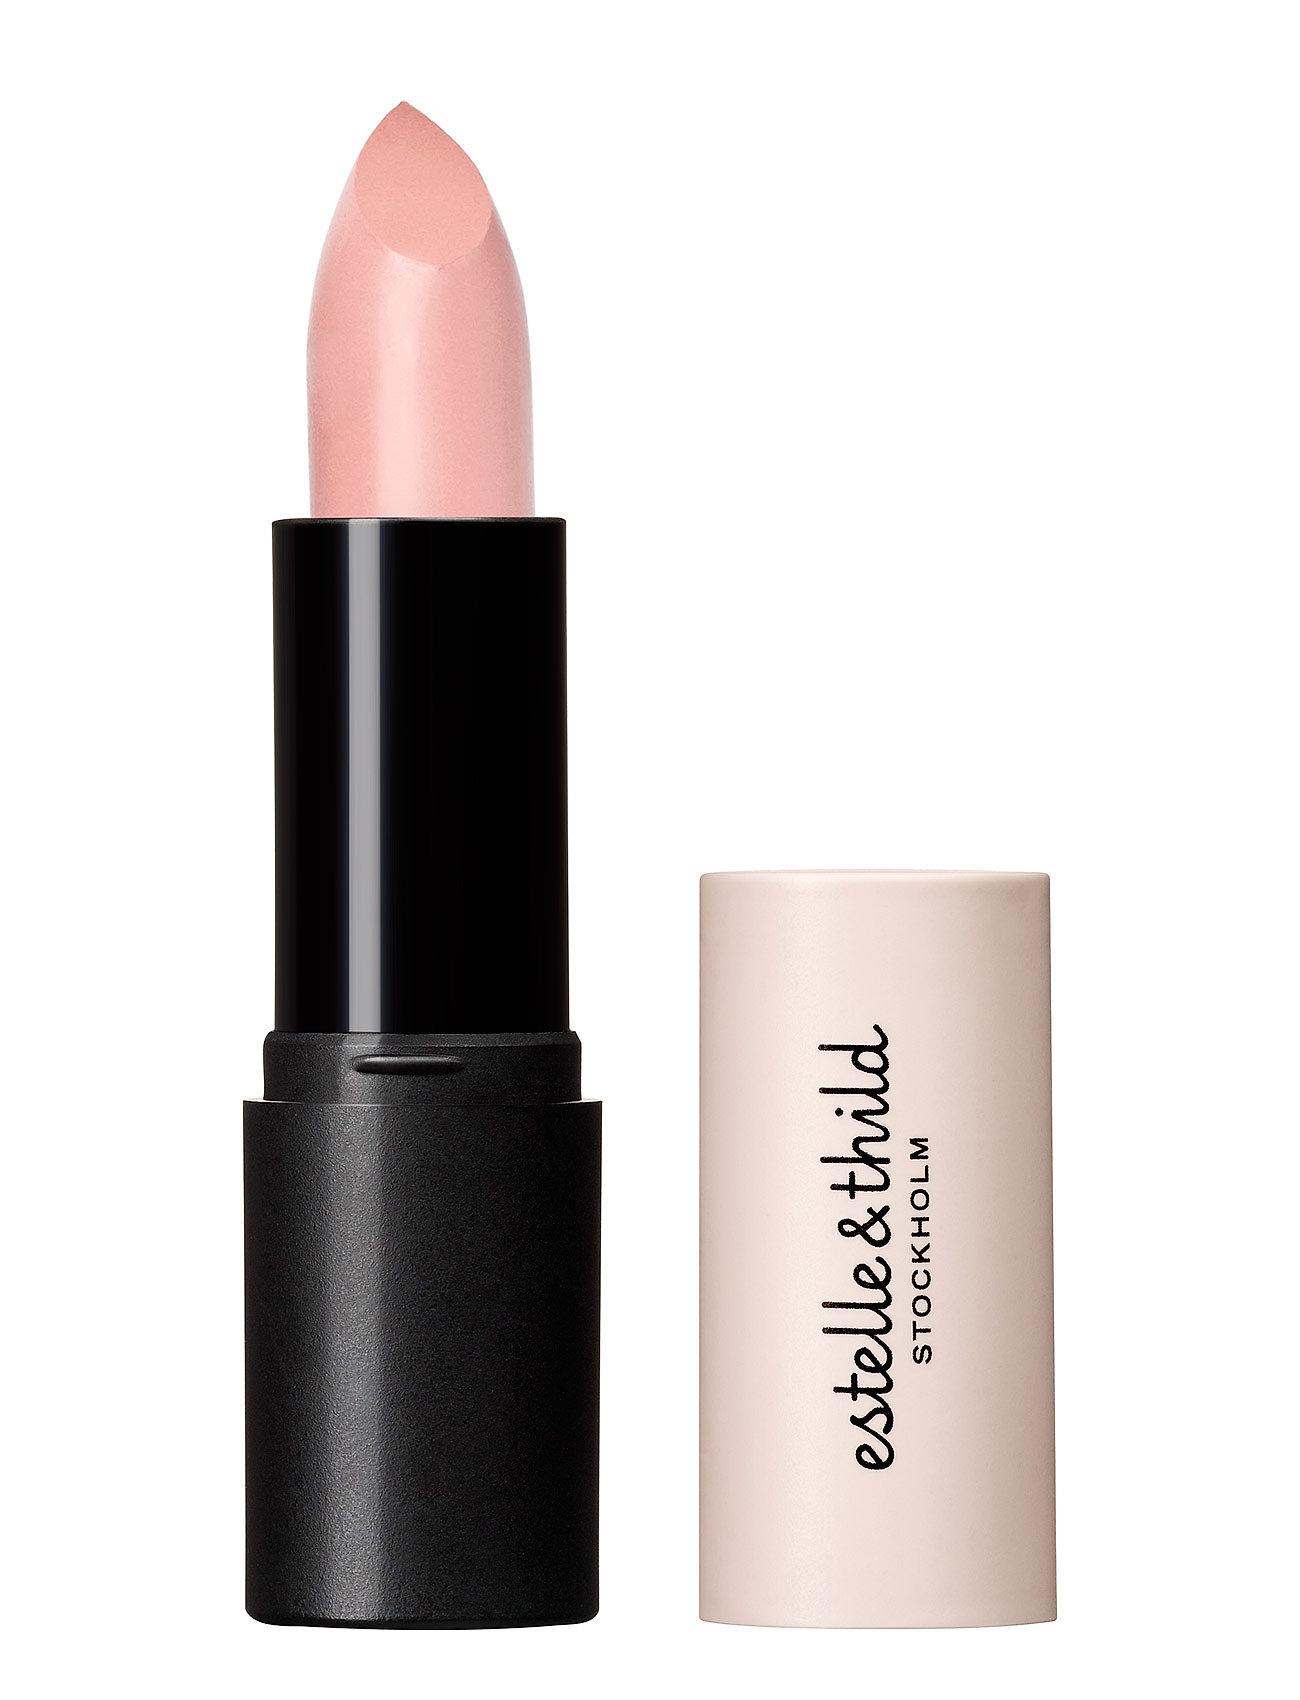 Estelle & Thild BioMineral Cream Lipstick Springtime - SPRINGTIME